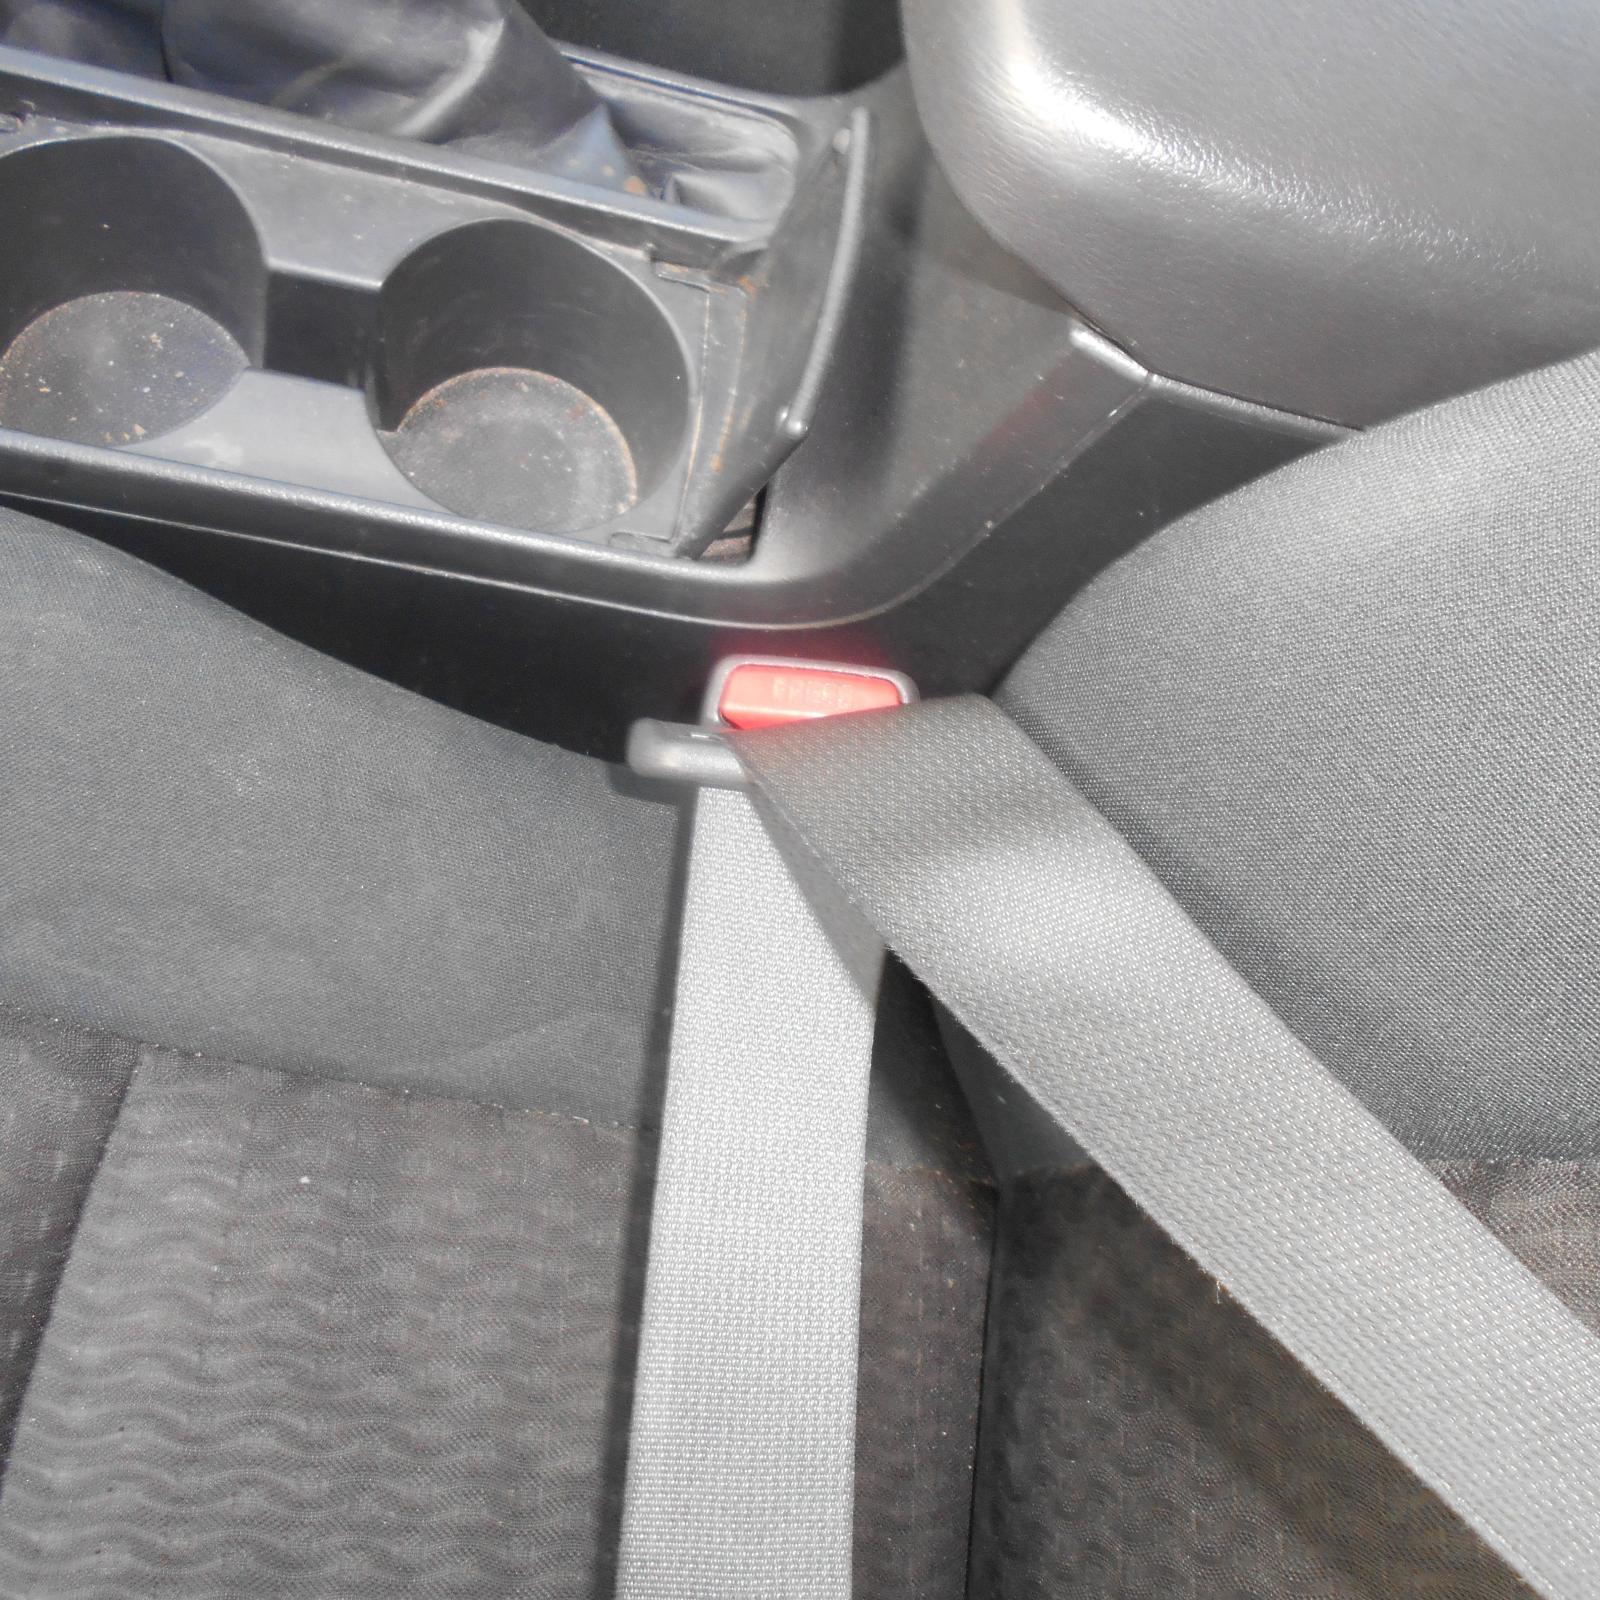 TOYOTA COROLLA, Seatbelt/Stalk, LH FRONT, SEAT BELT ONLY, ZRE152/153R, 03/07-10/13